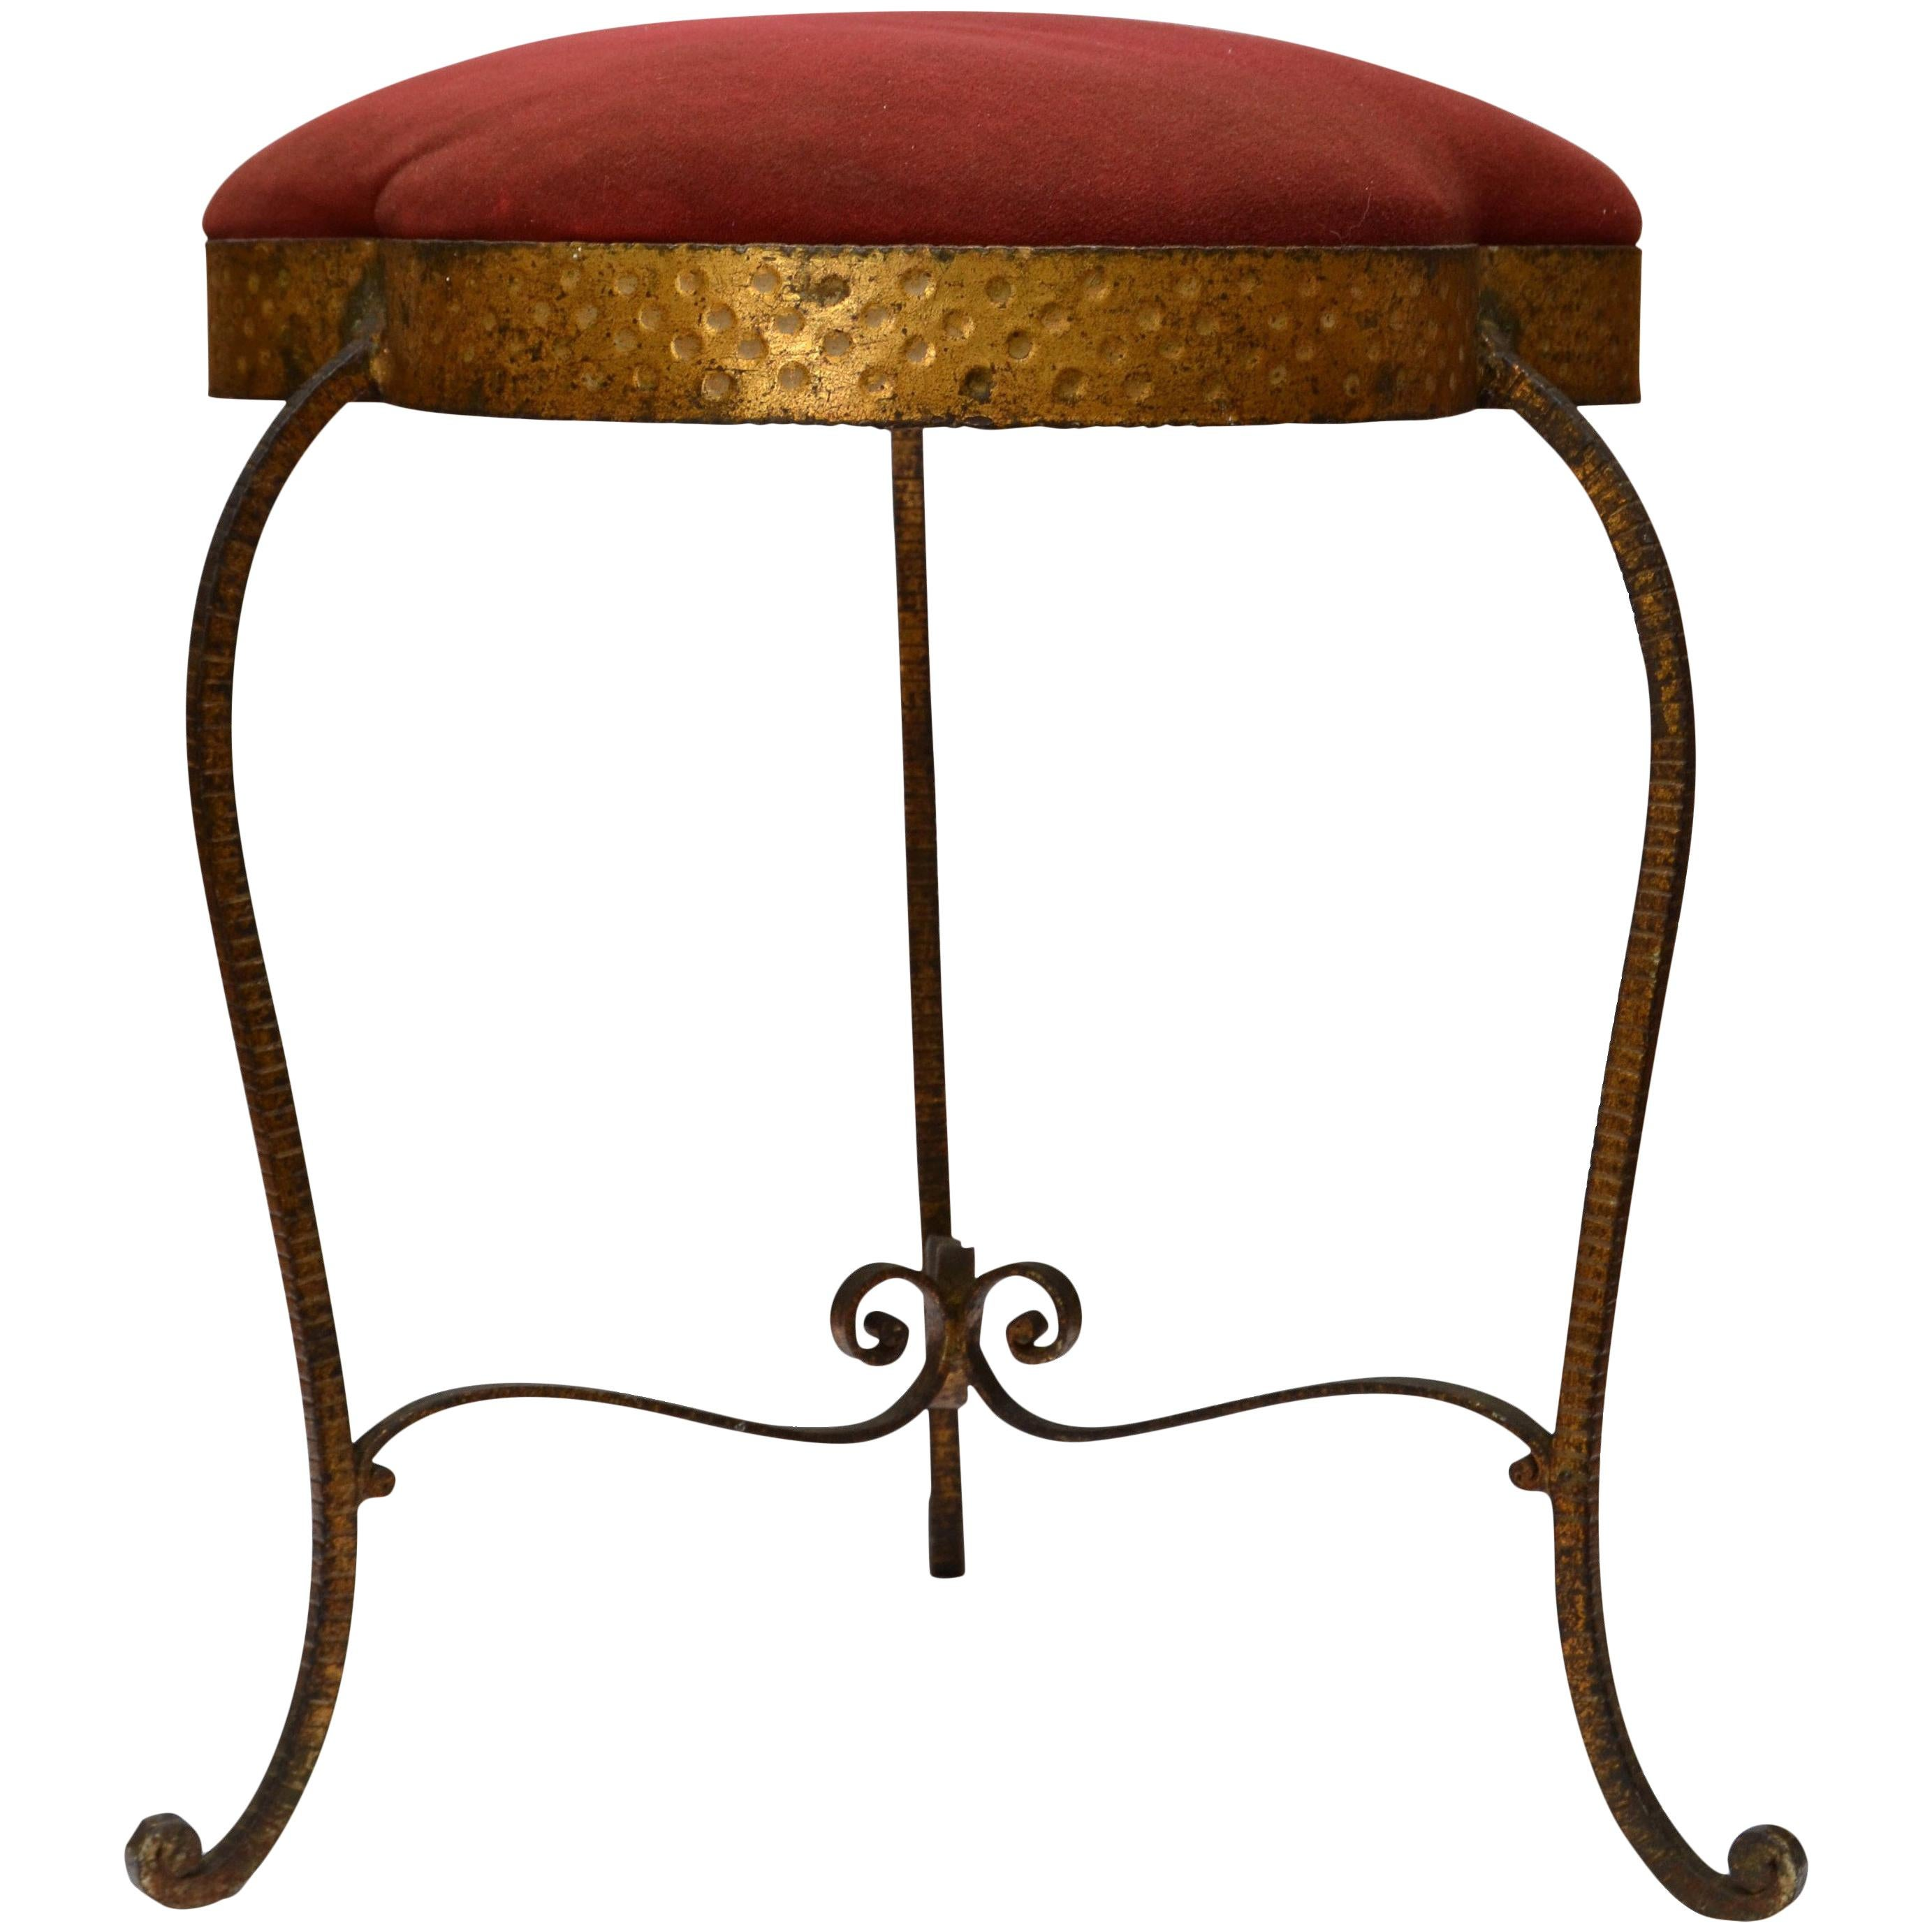 Italian Art Deco Style Wrought Iron Gilt Finished Tabouret by Pier Luigi Colli